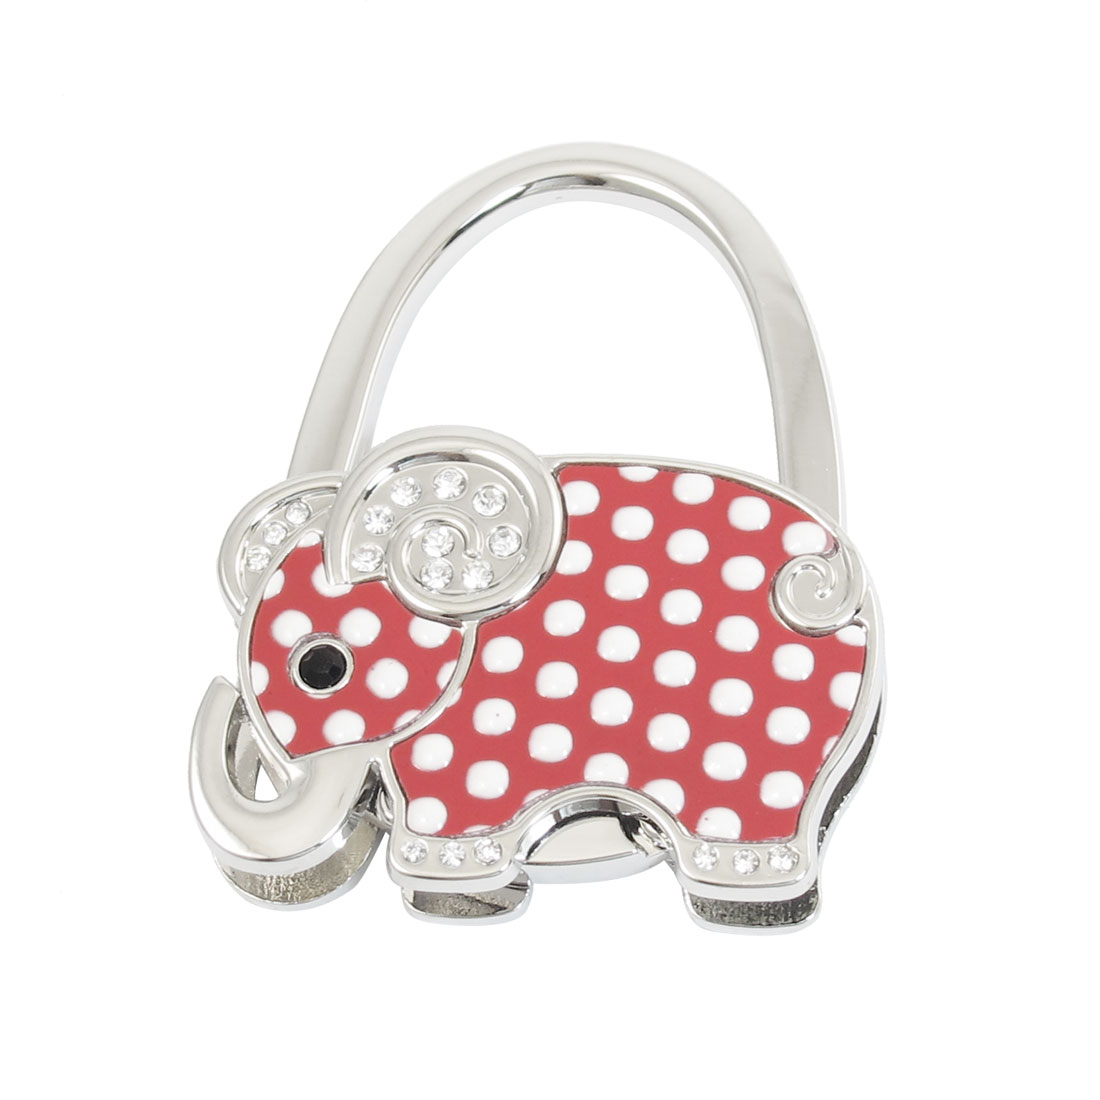 Women Pink Elephant Shape Design Silver Tone Foldable Hand Bag Purse Hanger Hook